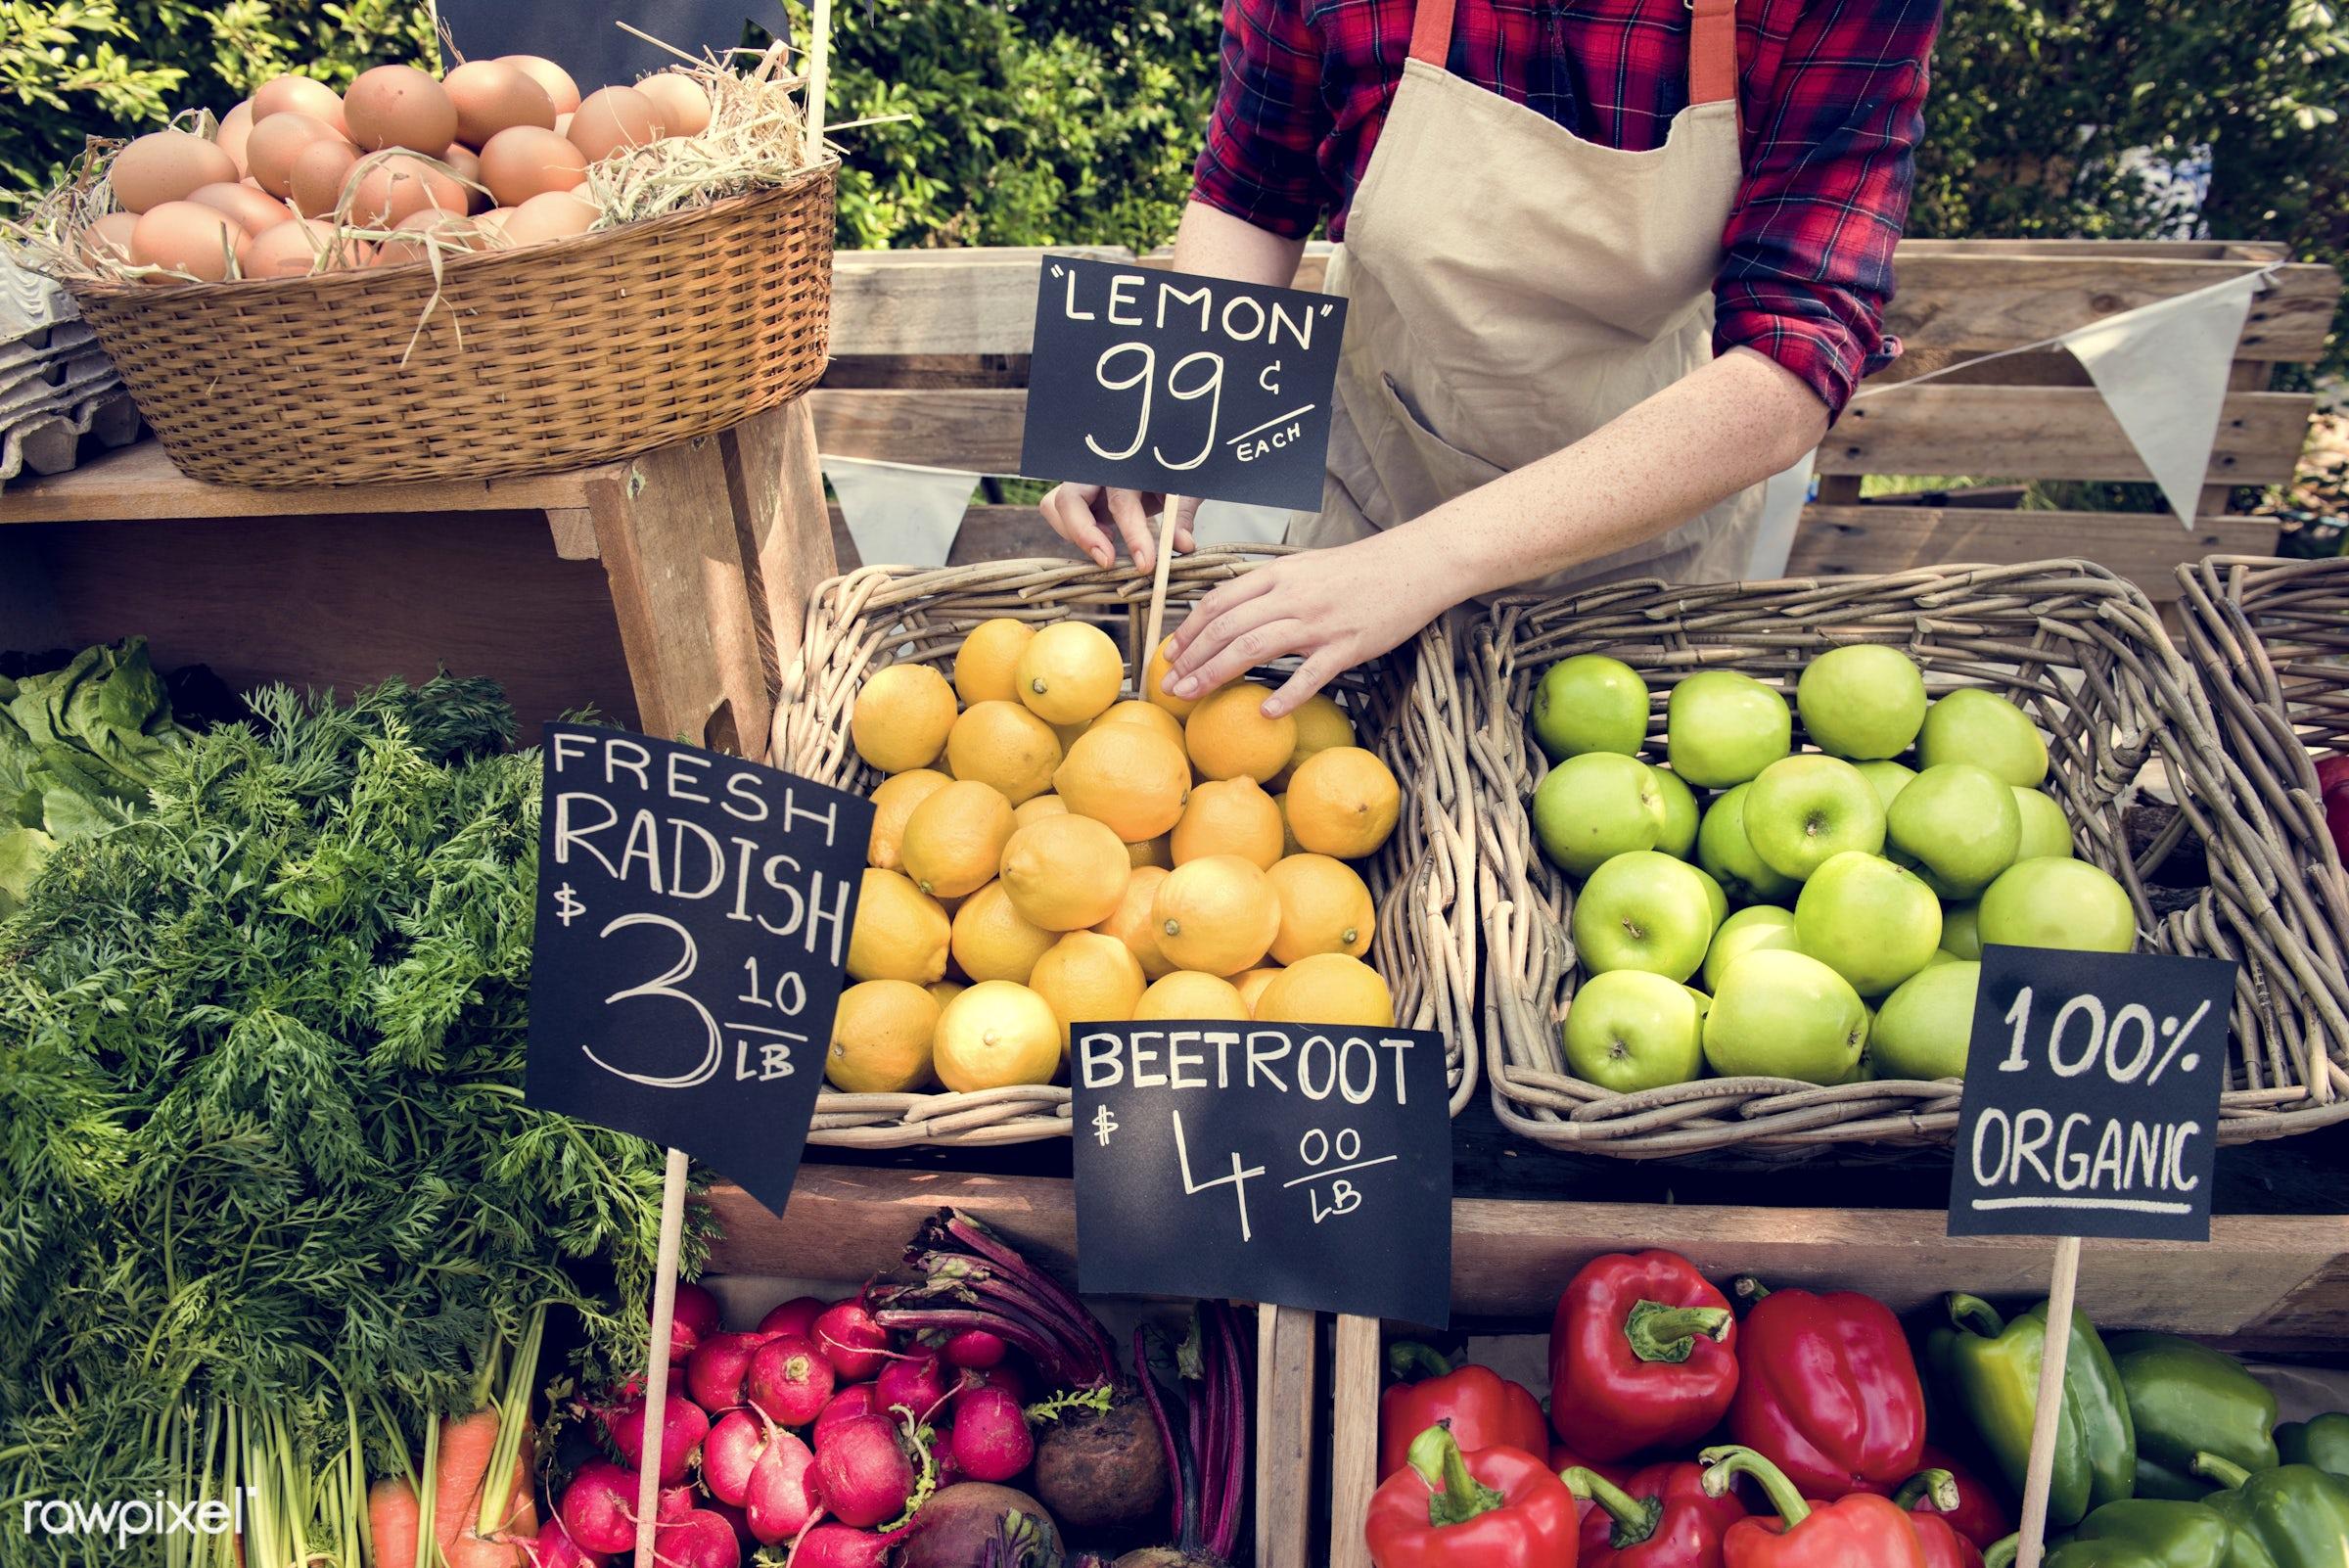 grocery, shop, nutritious, store, carrot, bell pepper, egg, farmer, fresh, healthy eating, marketplace, banner, fruit,...